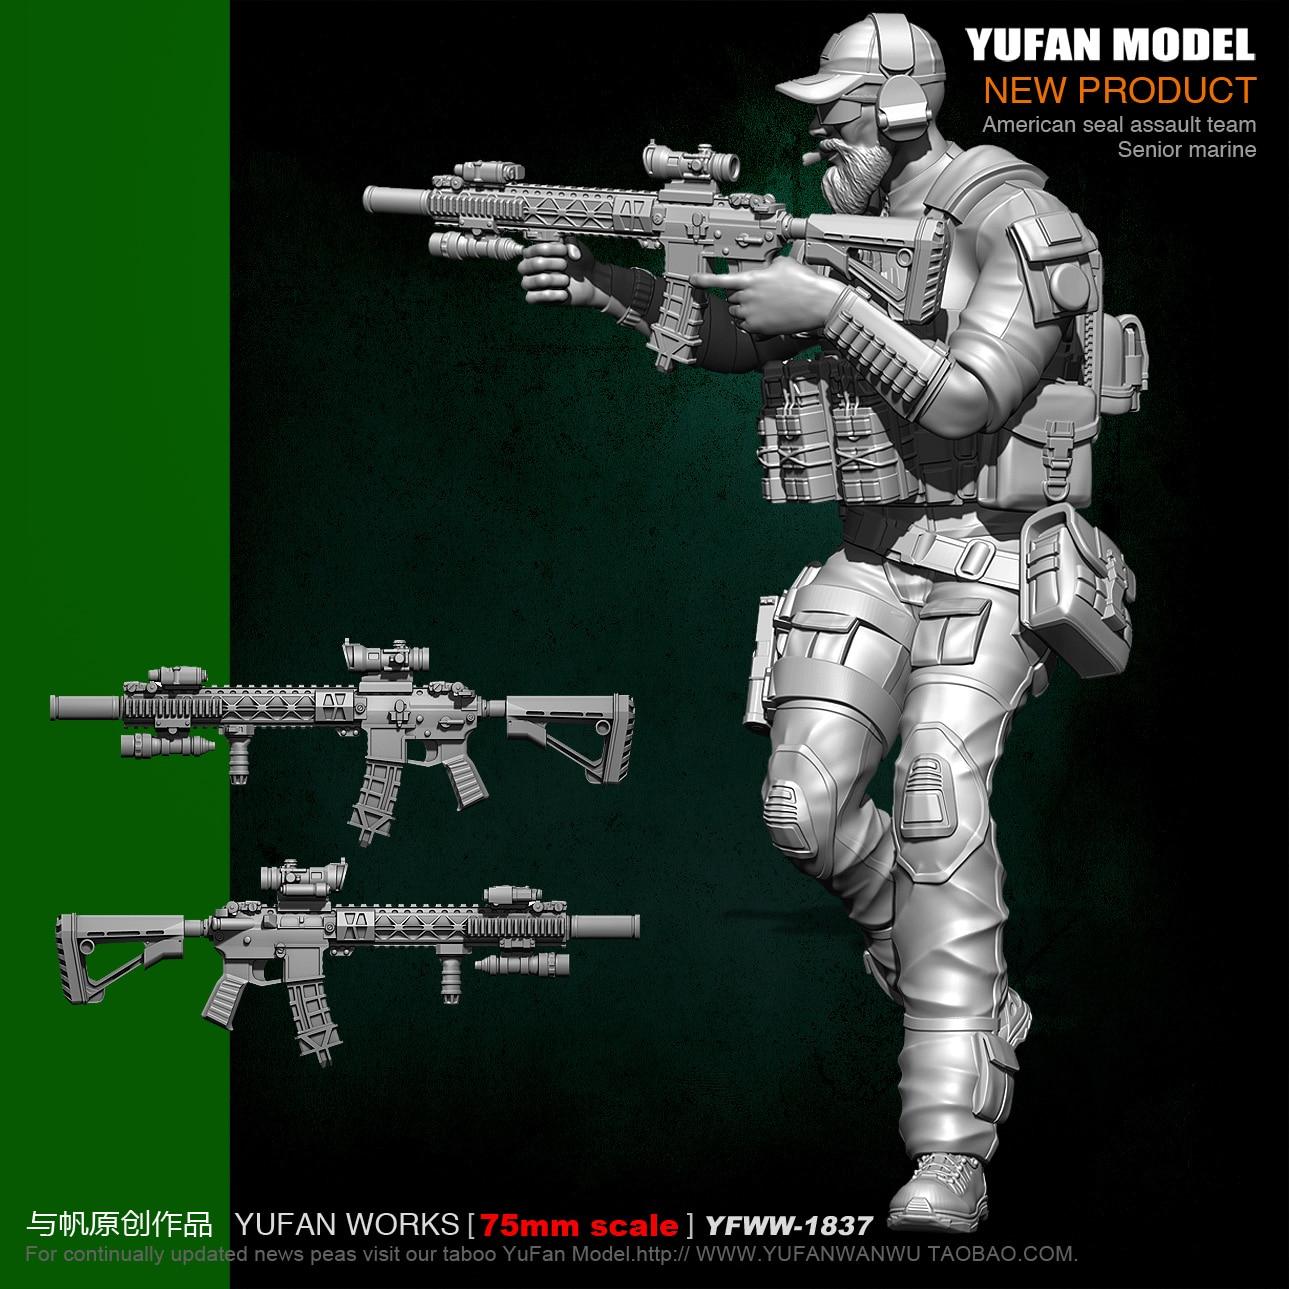 Yufan Model 1/24 Soldier Model Kit 75mm Us Seals Resin Soldier Platinum  Unmounted Yfww-1837